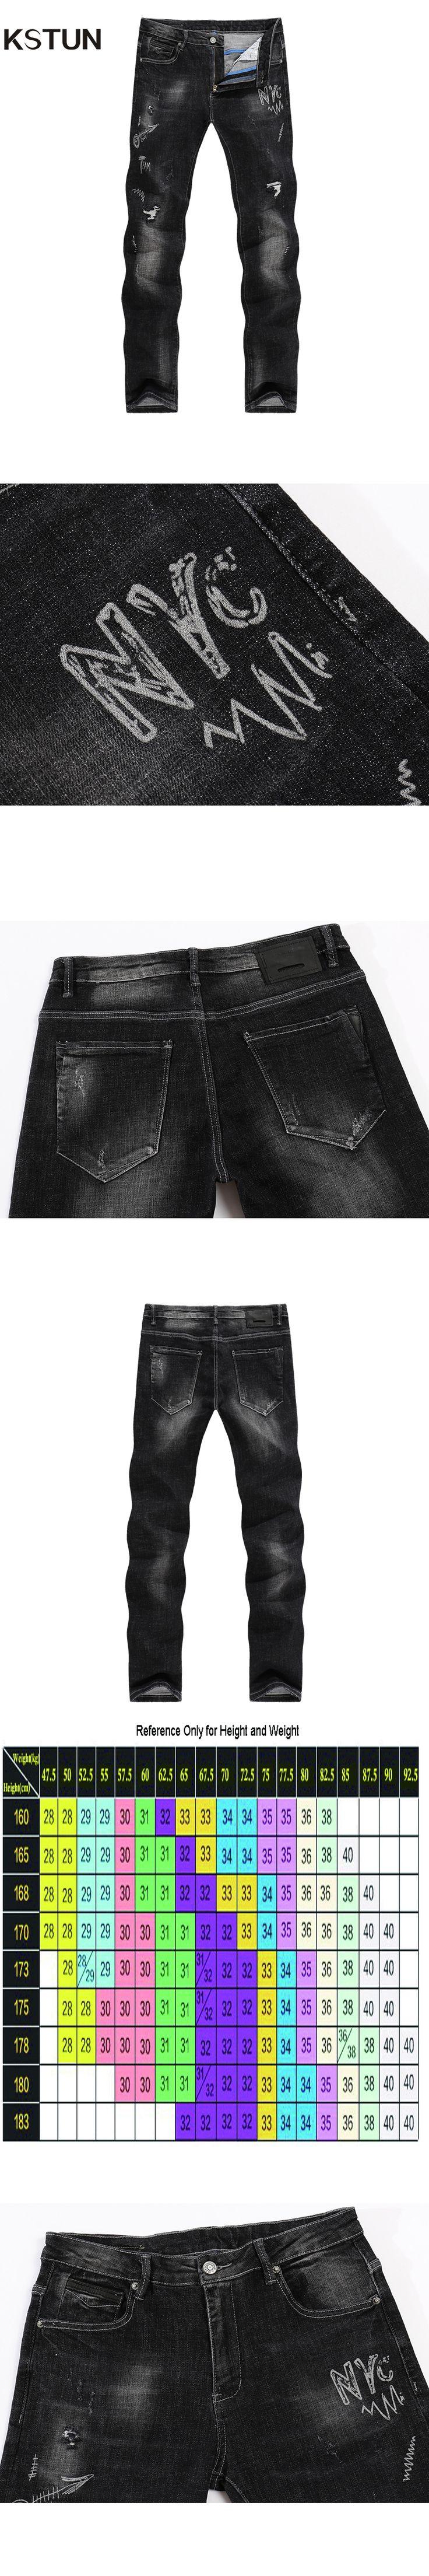 KSTUN Jeans Men Winter Black Ripped Torn Pants High Quality Stretch Printed Letters Biker Moto Jeans Hip hop Trousers Slim Leg